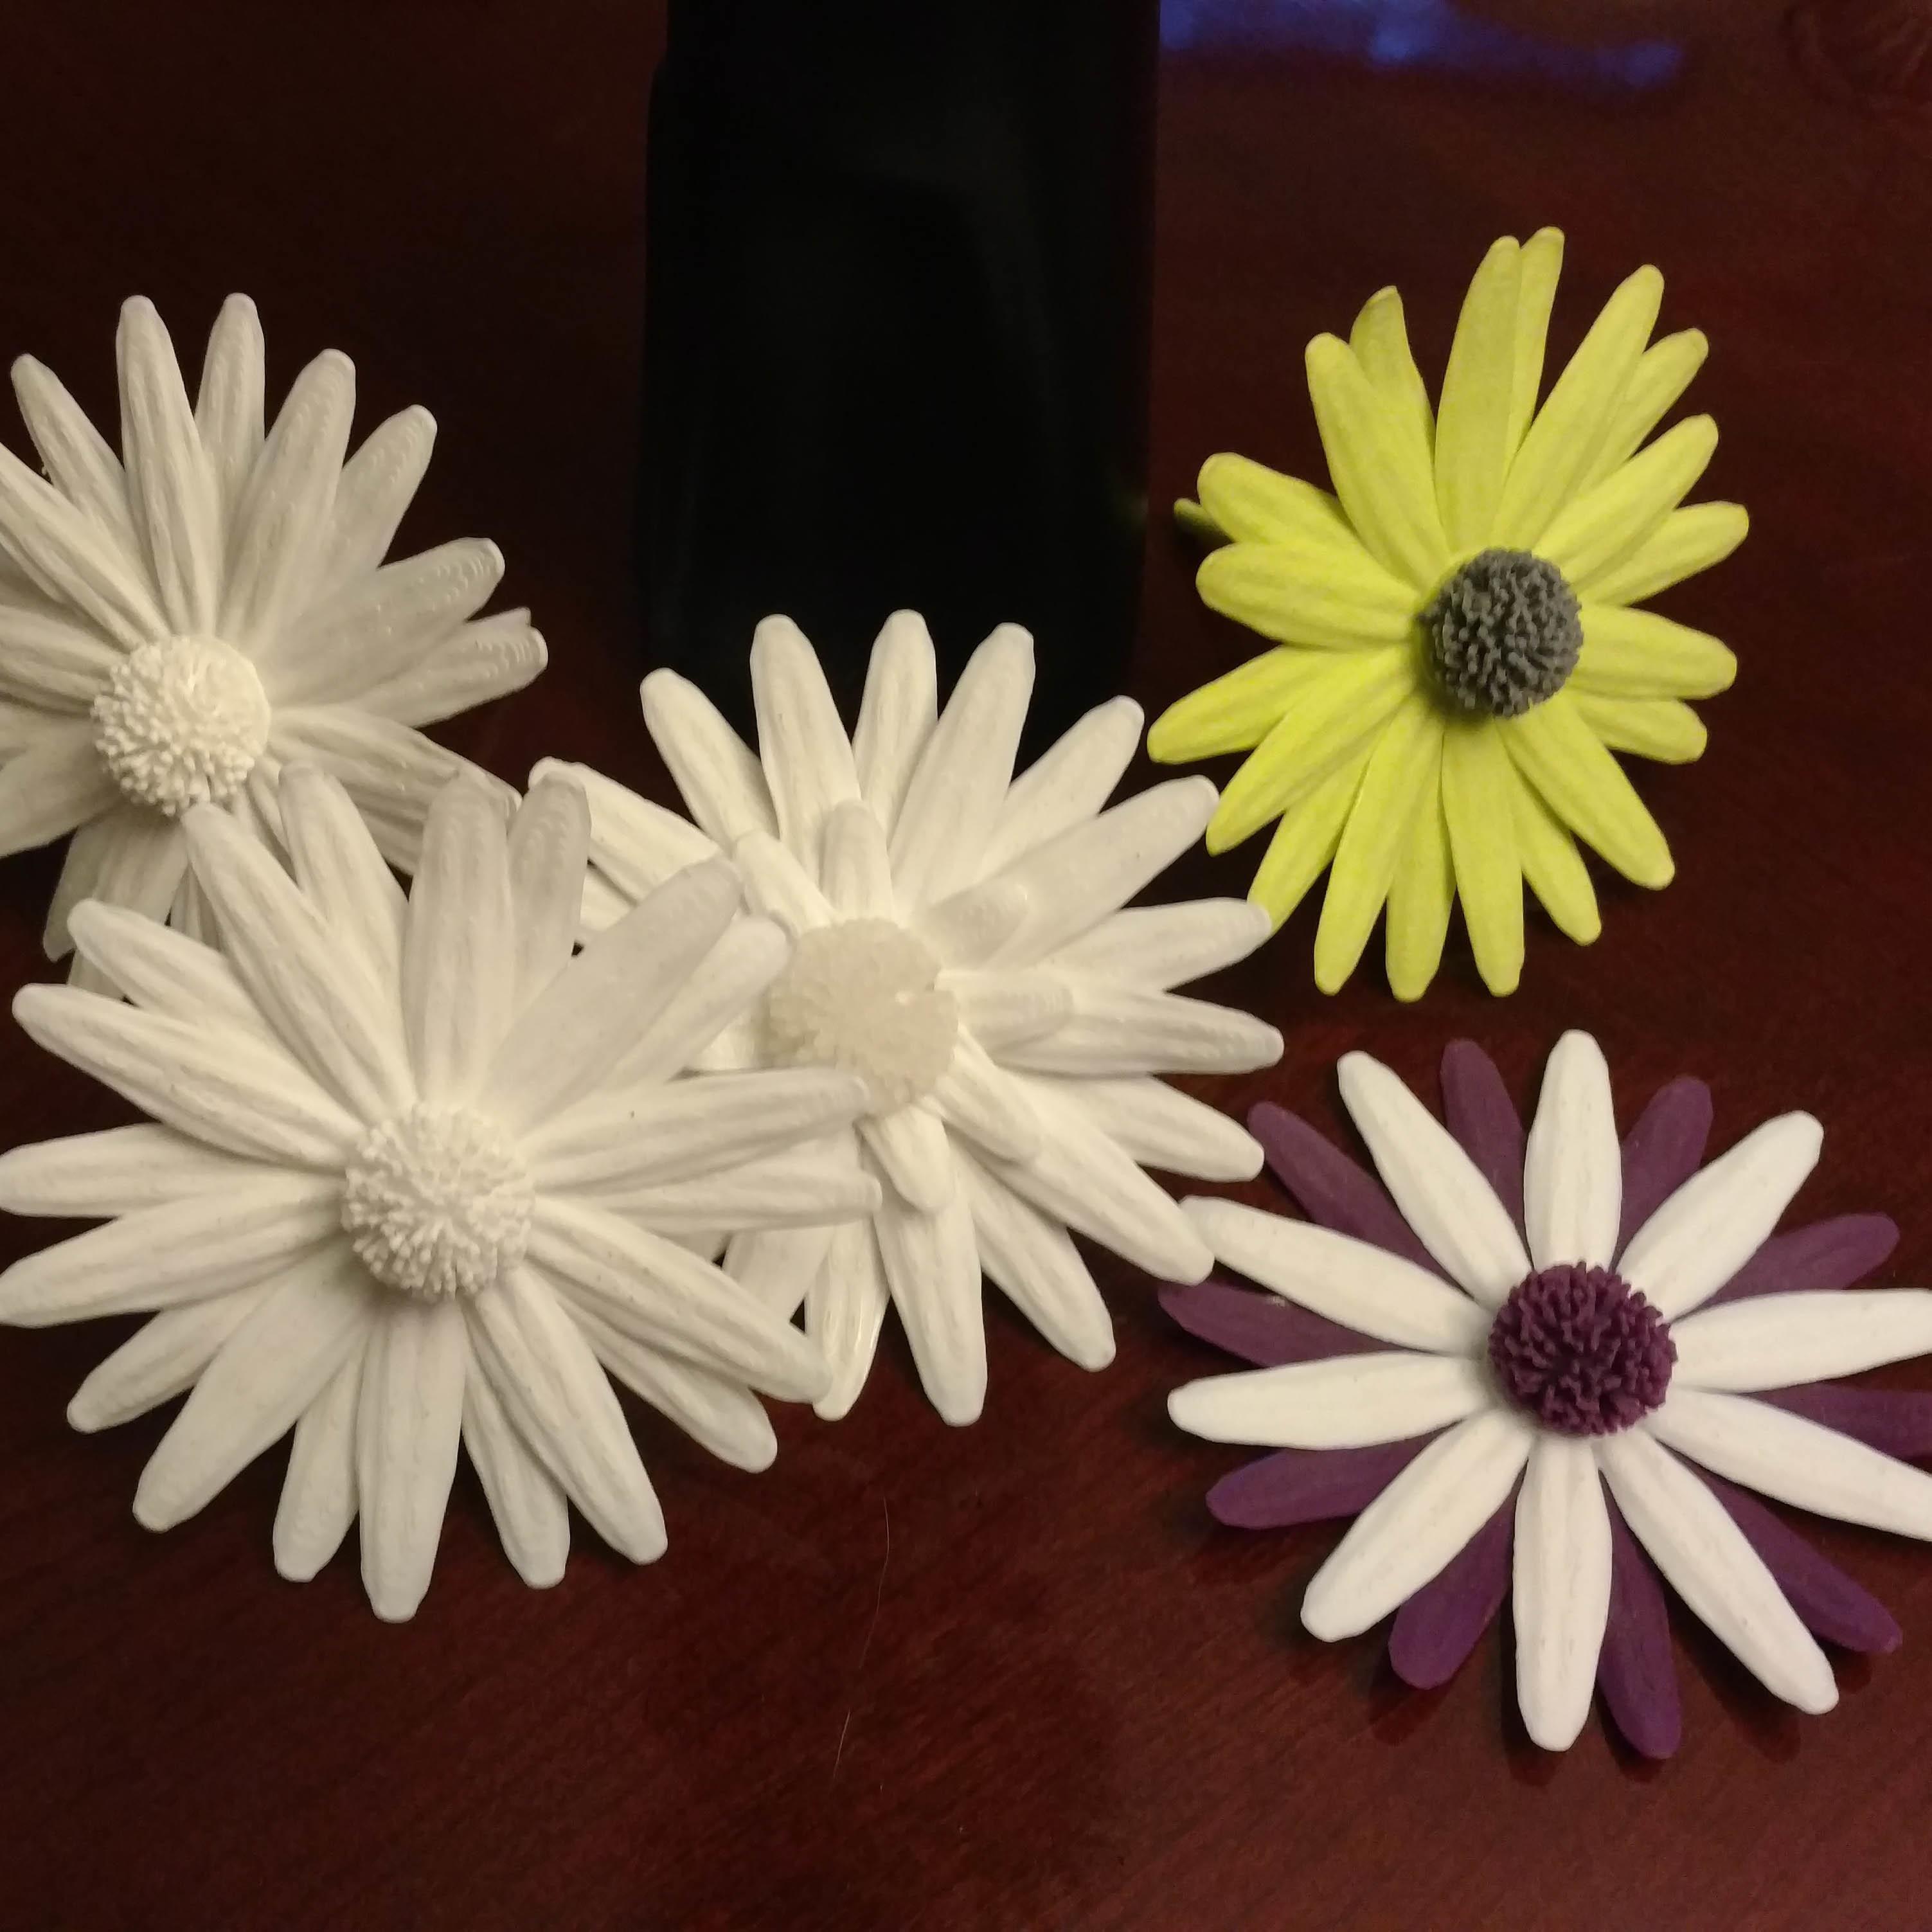 2.jpg Download free STL file Daisy - Flat flower • 3D printable template, mag-net